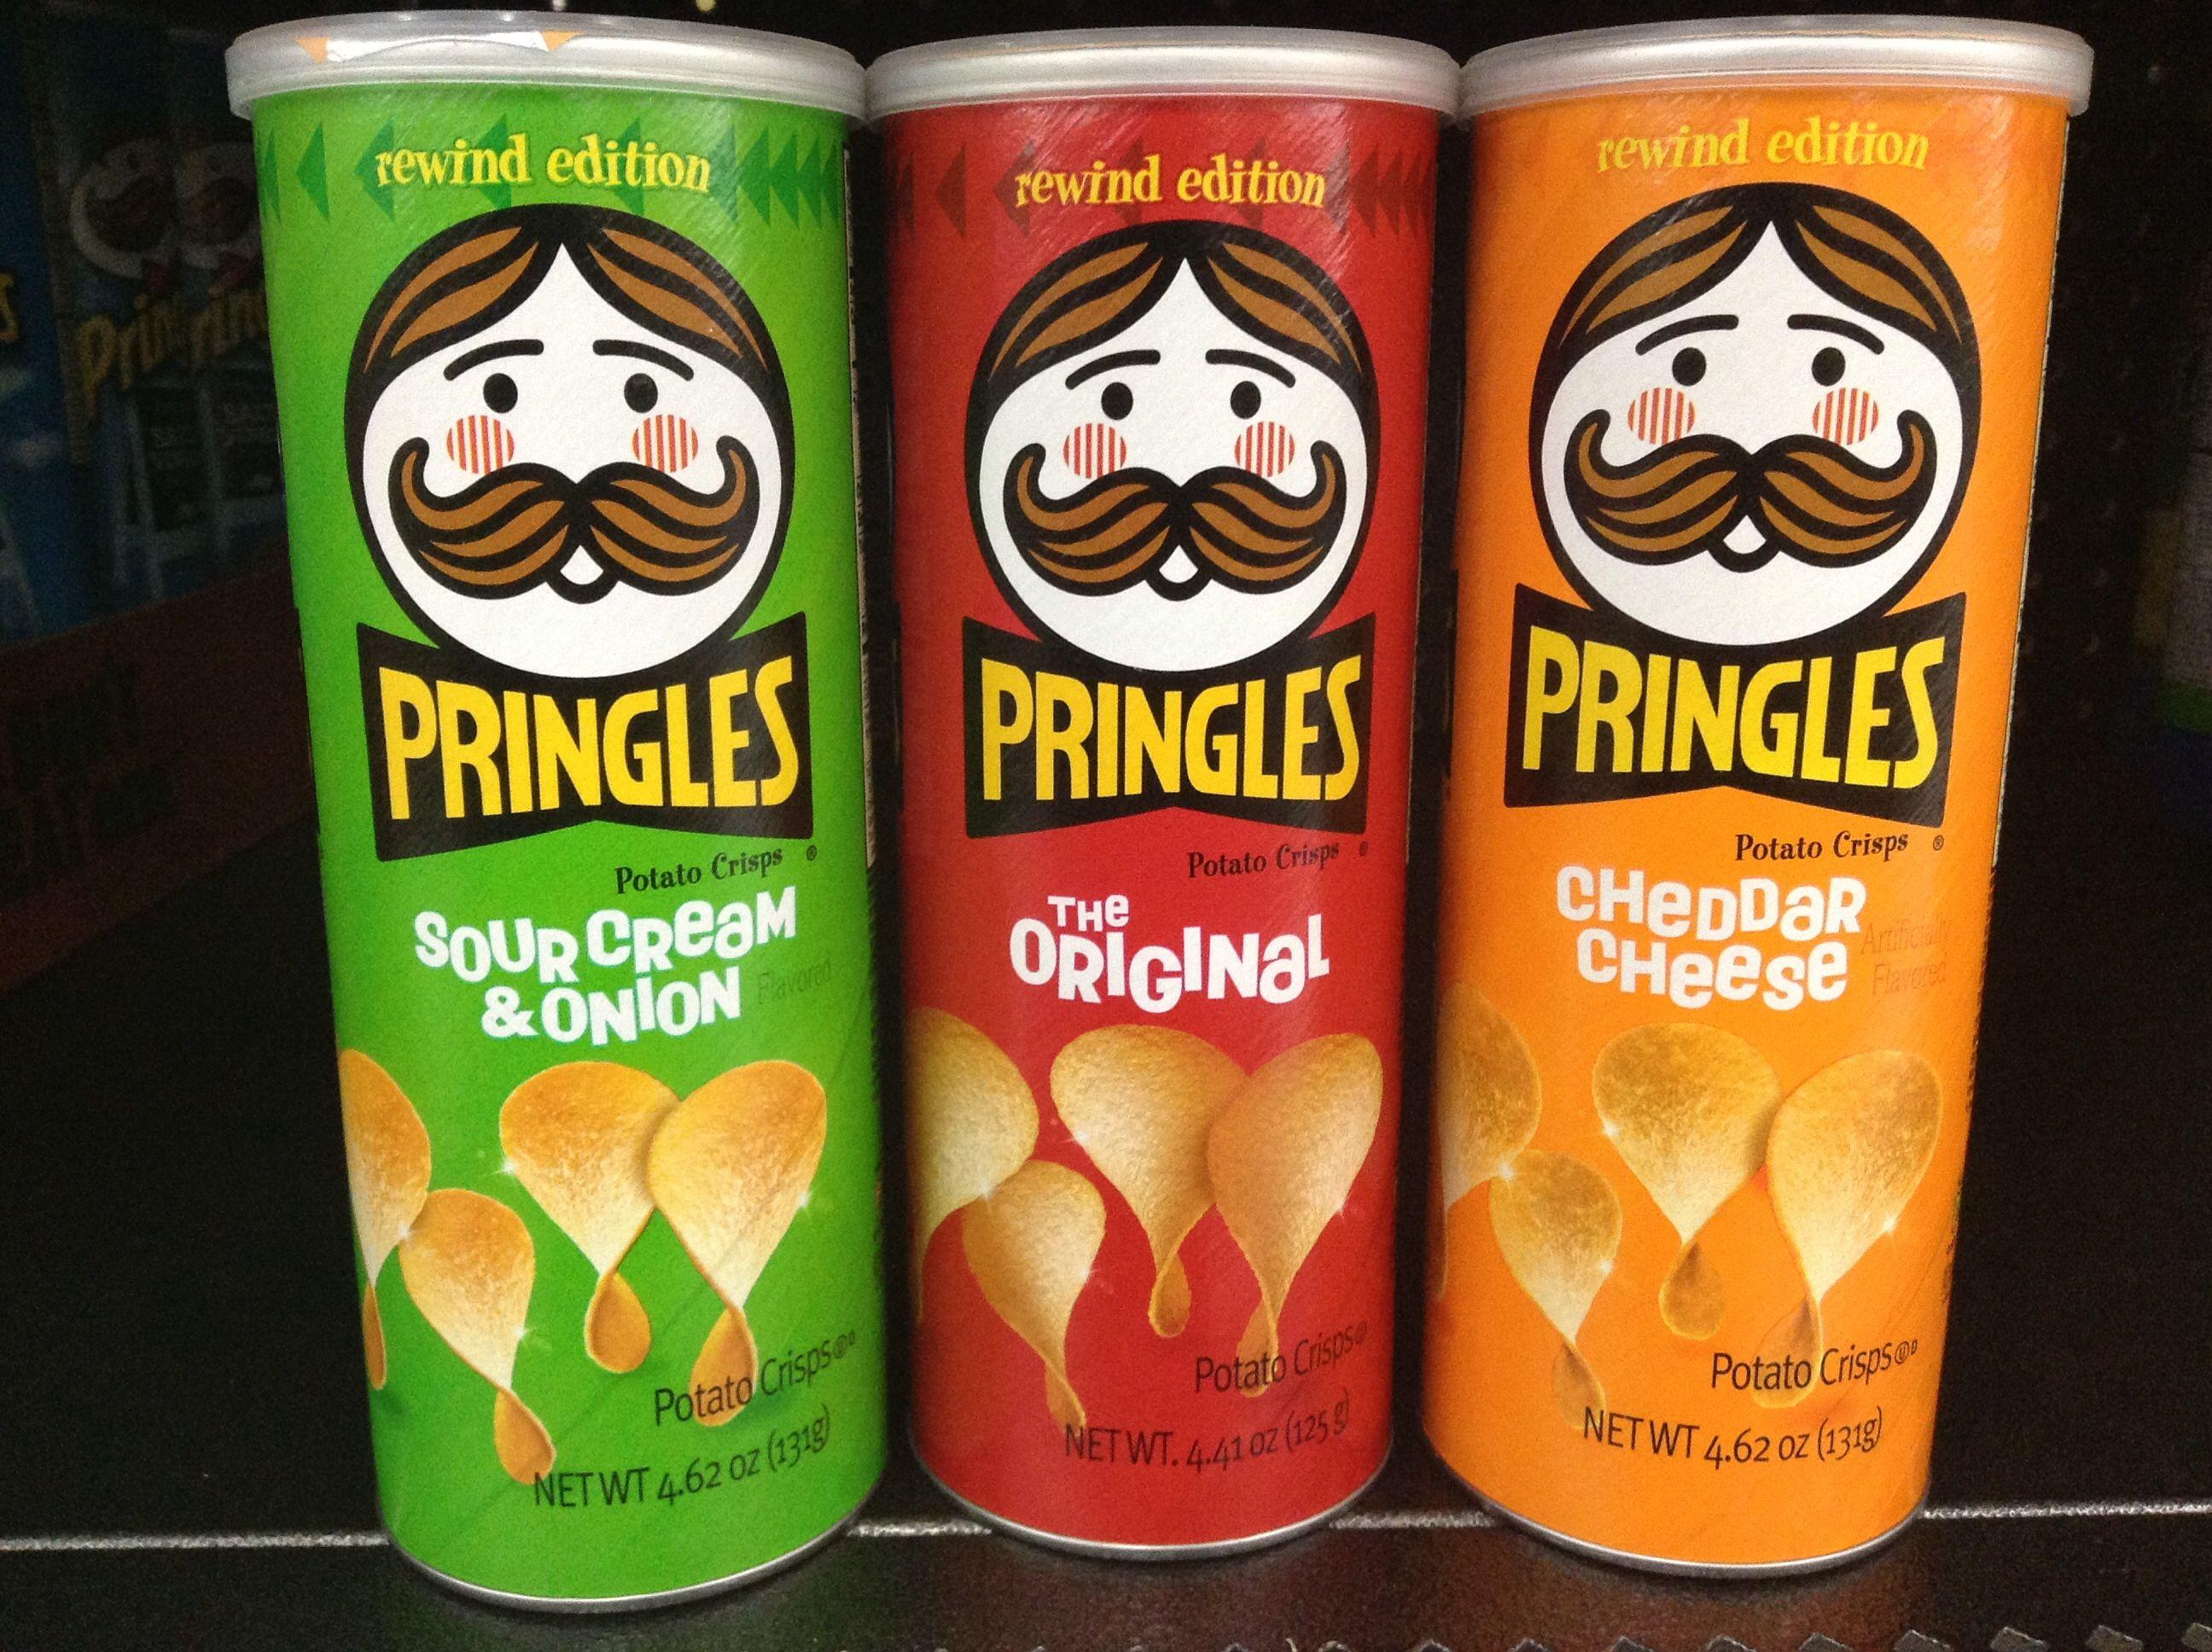 Pringles Rewind